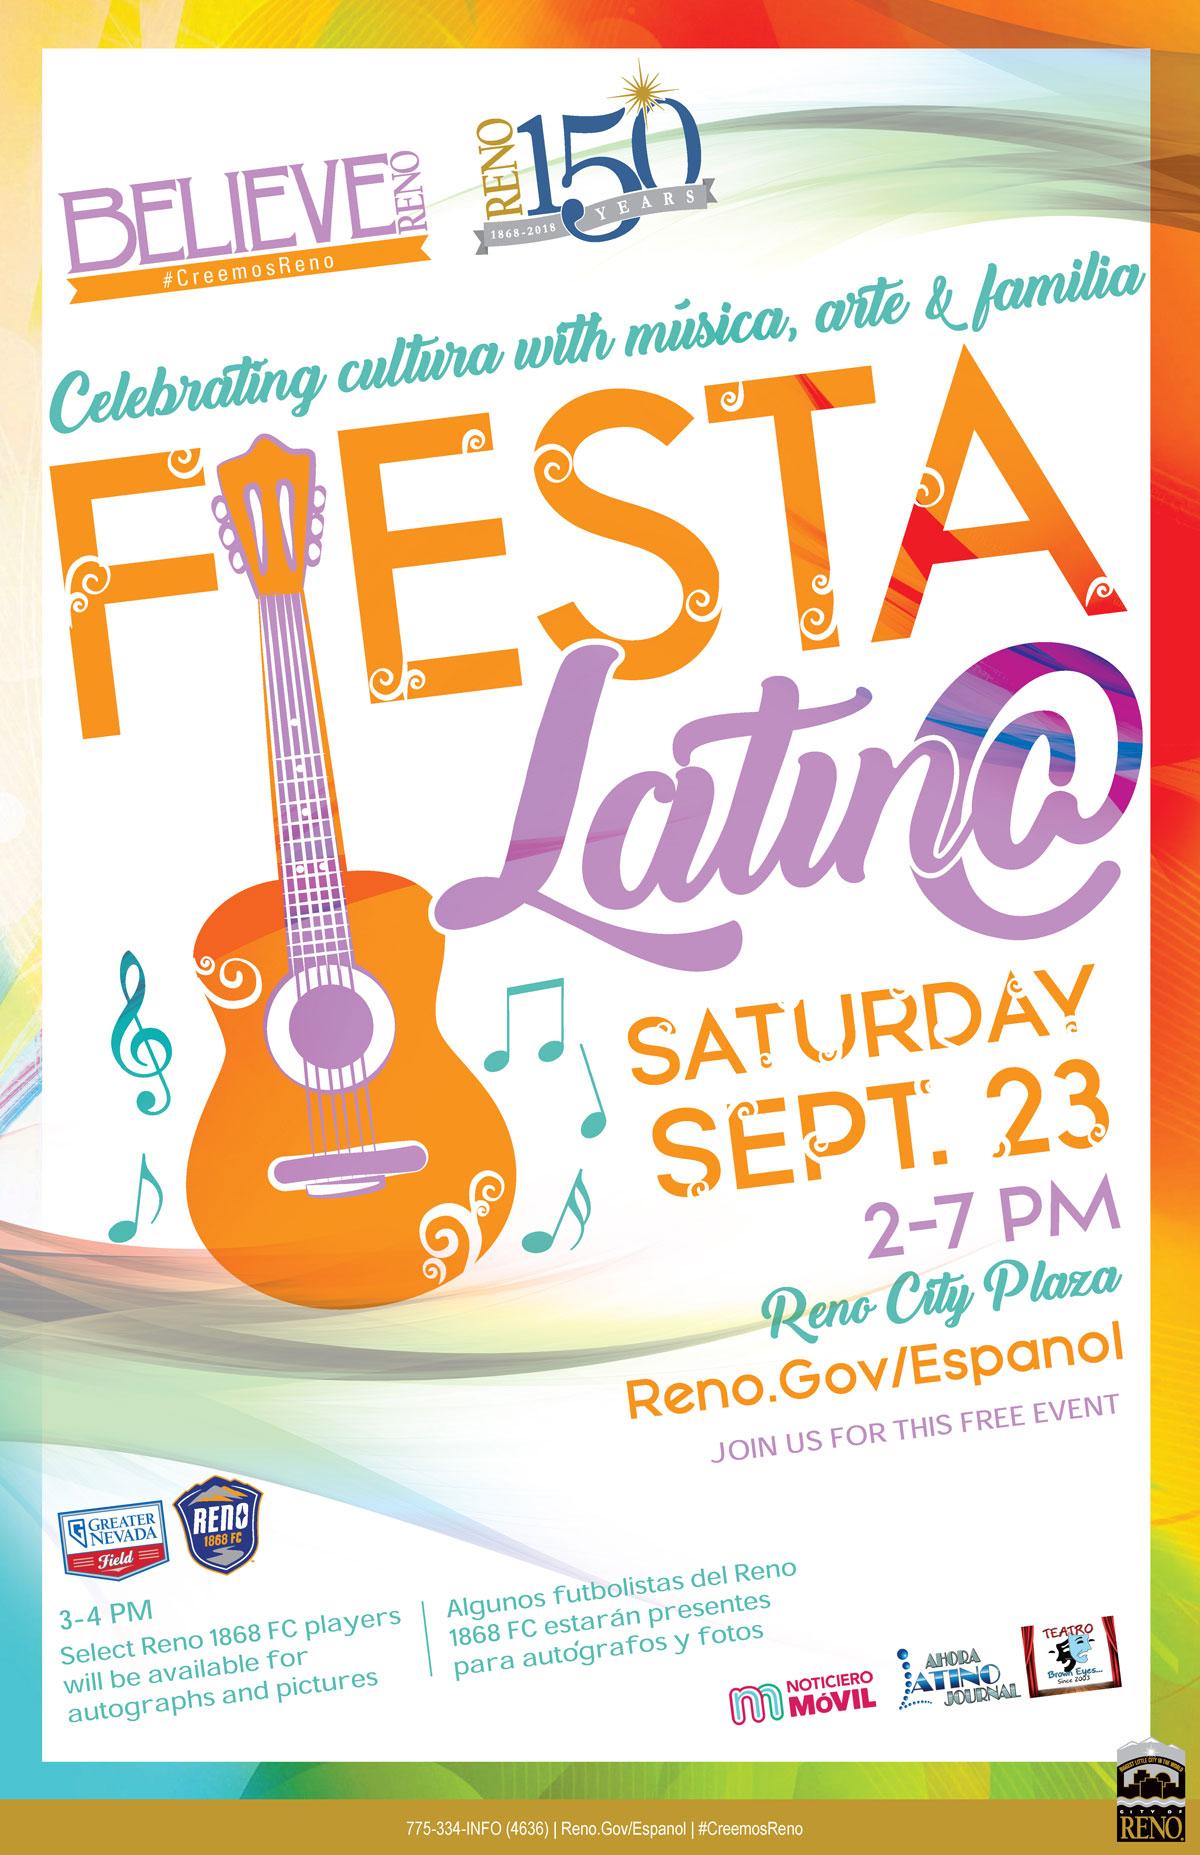 Fiesta Latina Flyer - Saturday September 23, 2-7pm on City Plaza